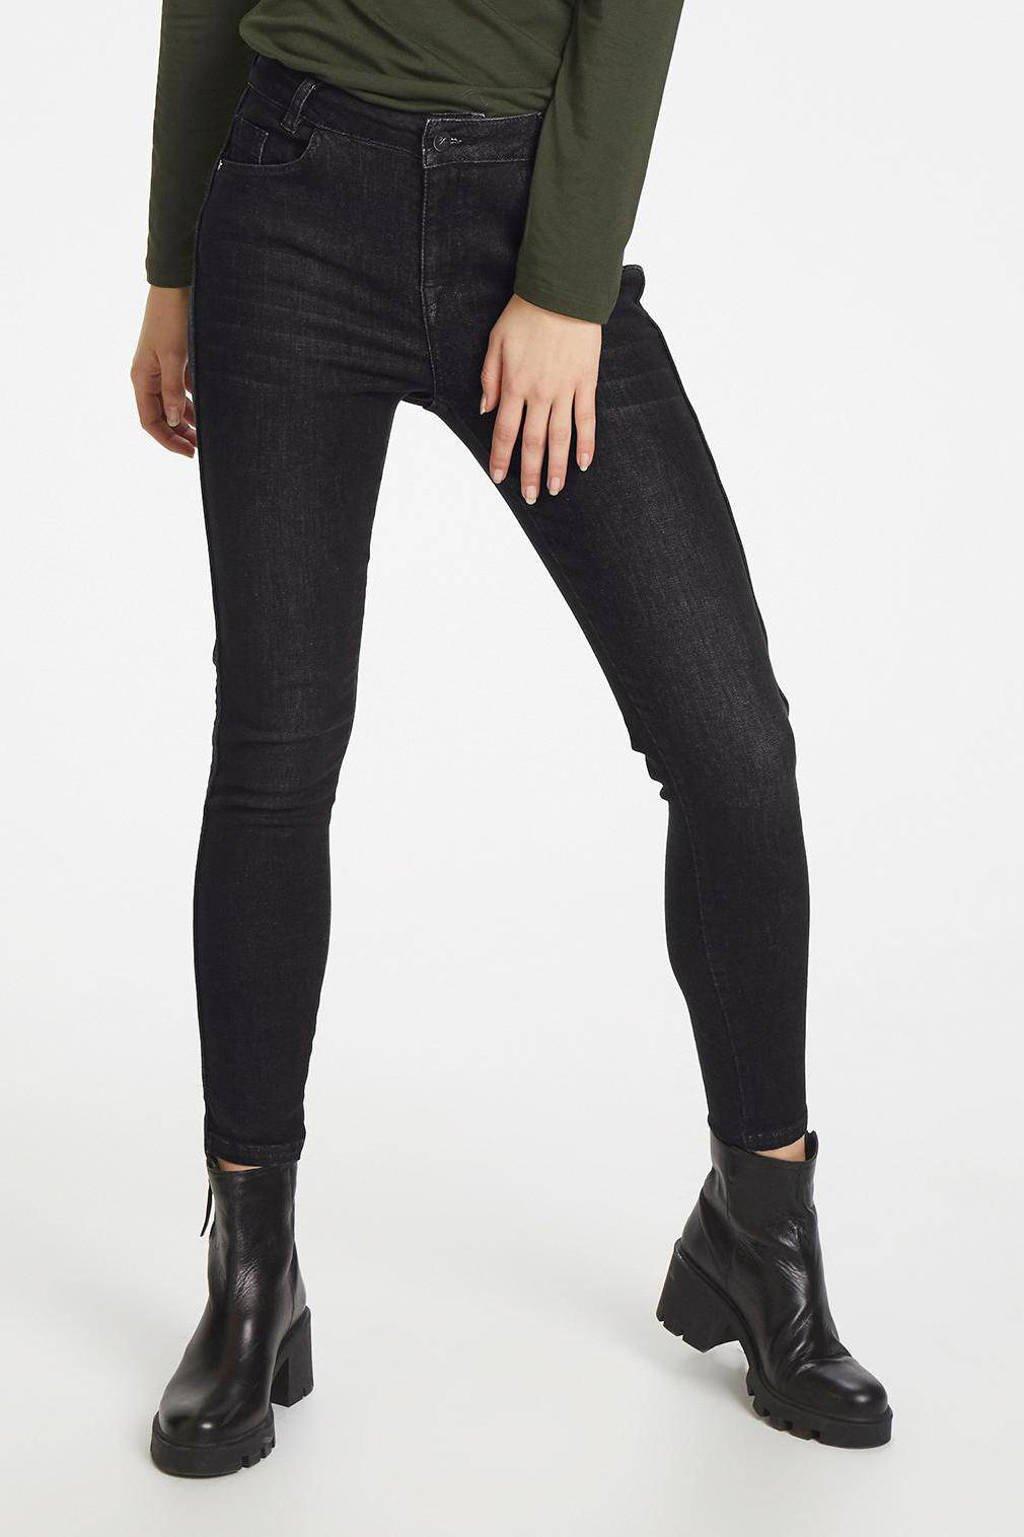 Denim Hunter high waist skinny jeans Monza black retro wash, Black Retro Wash